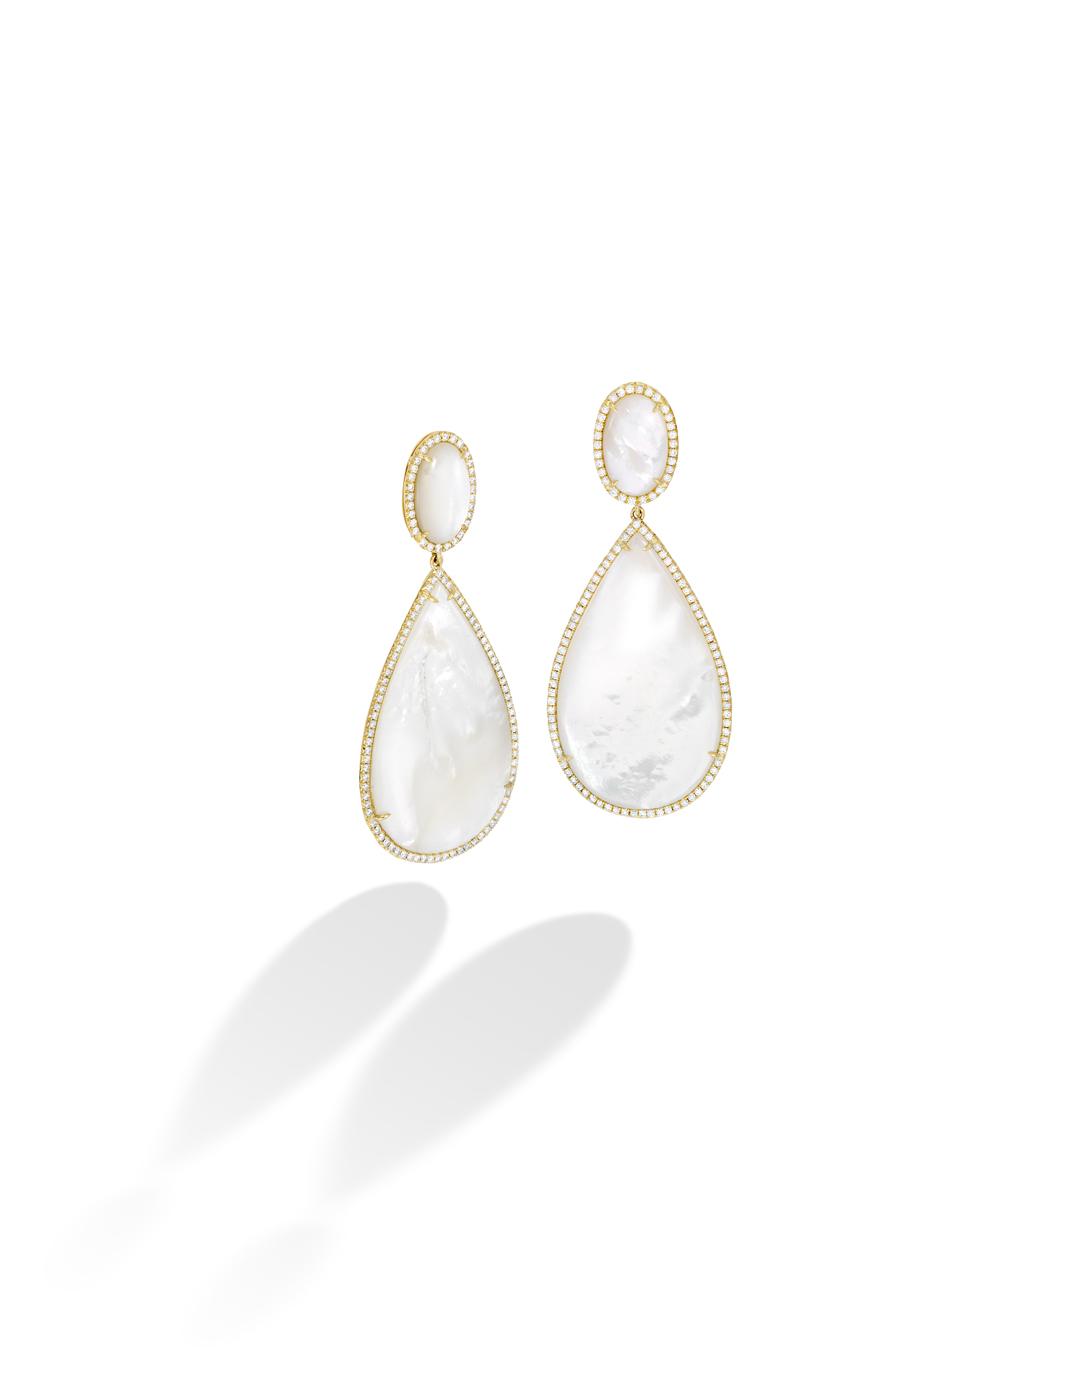 mish_products_earrings_Racine-MOP-YG-ER-1